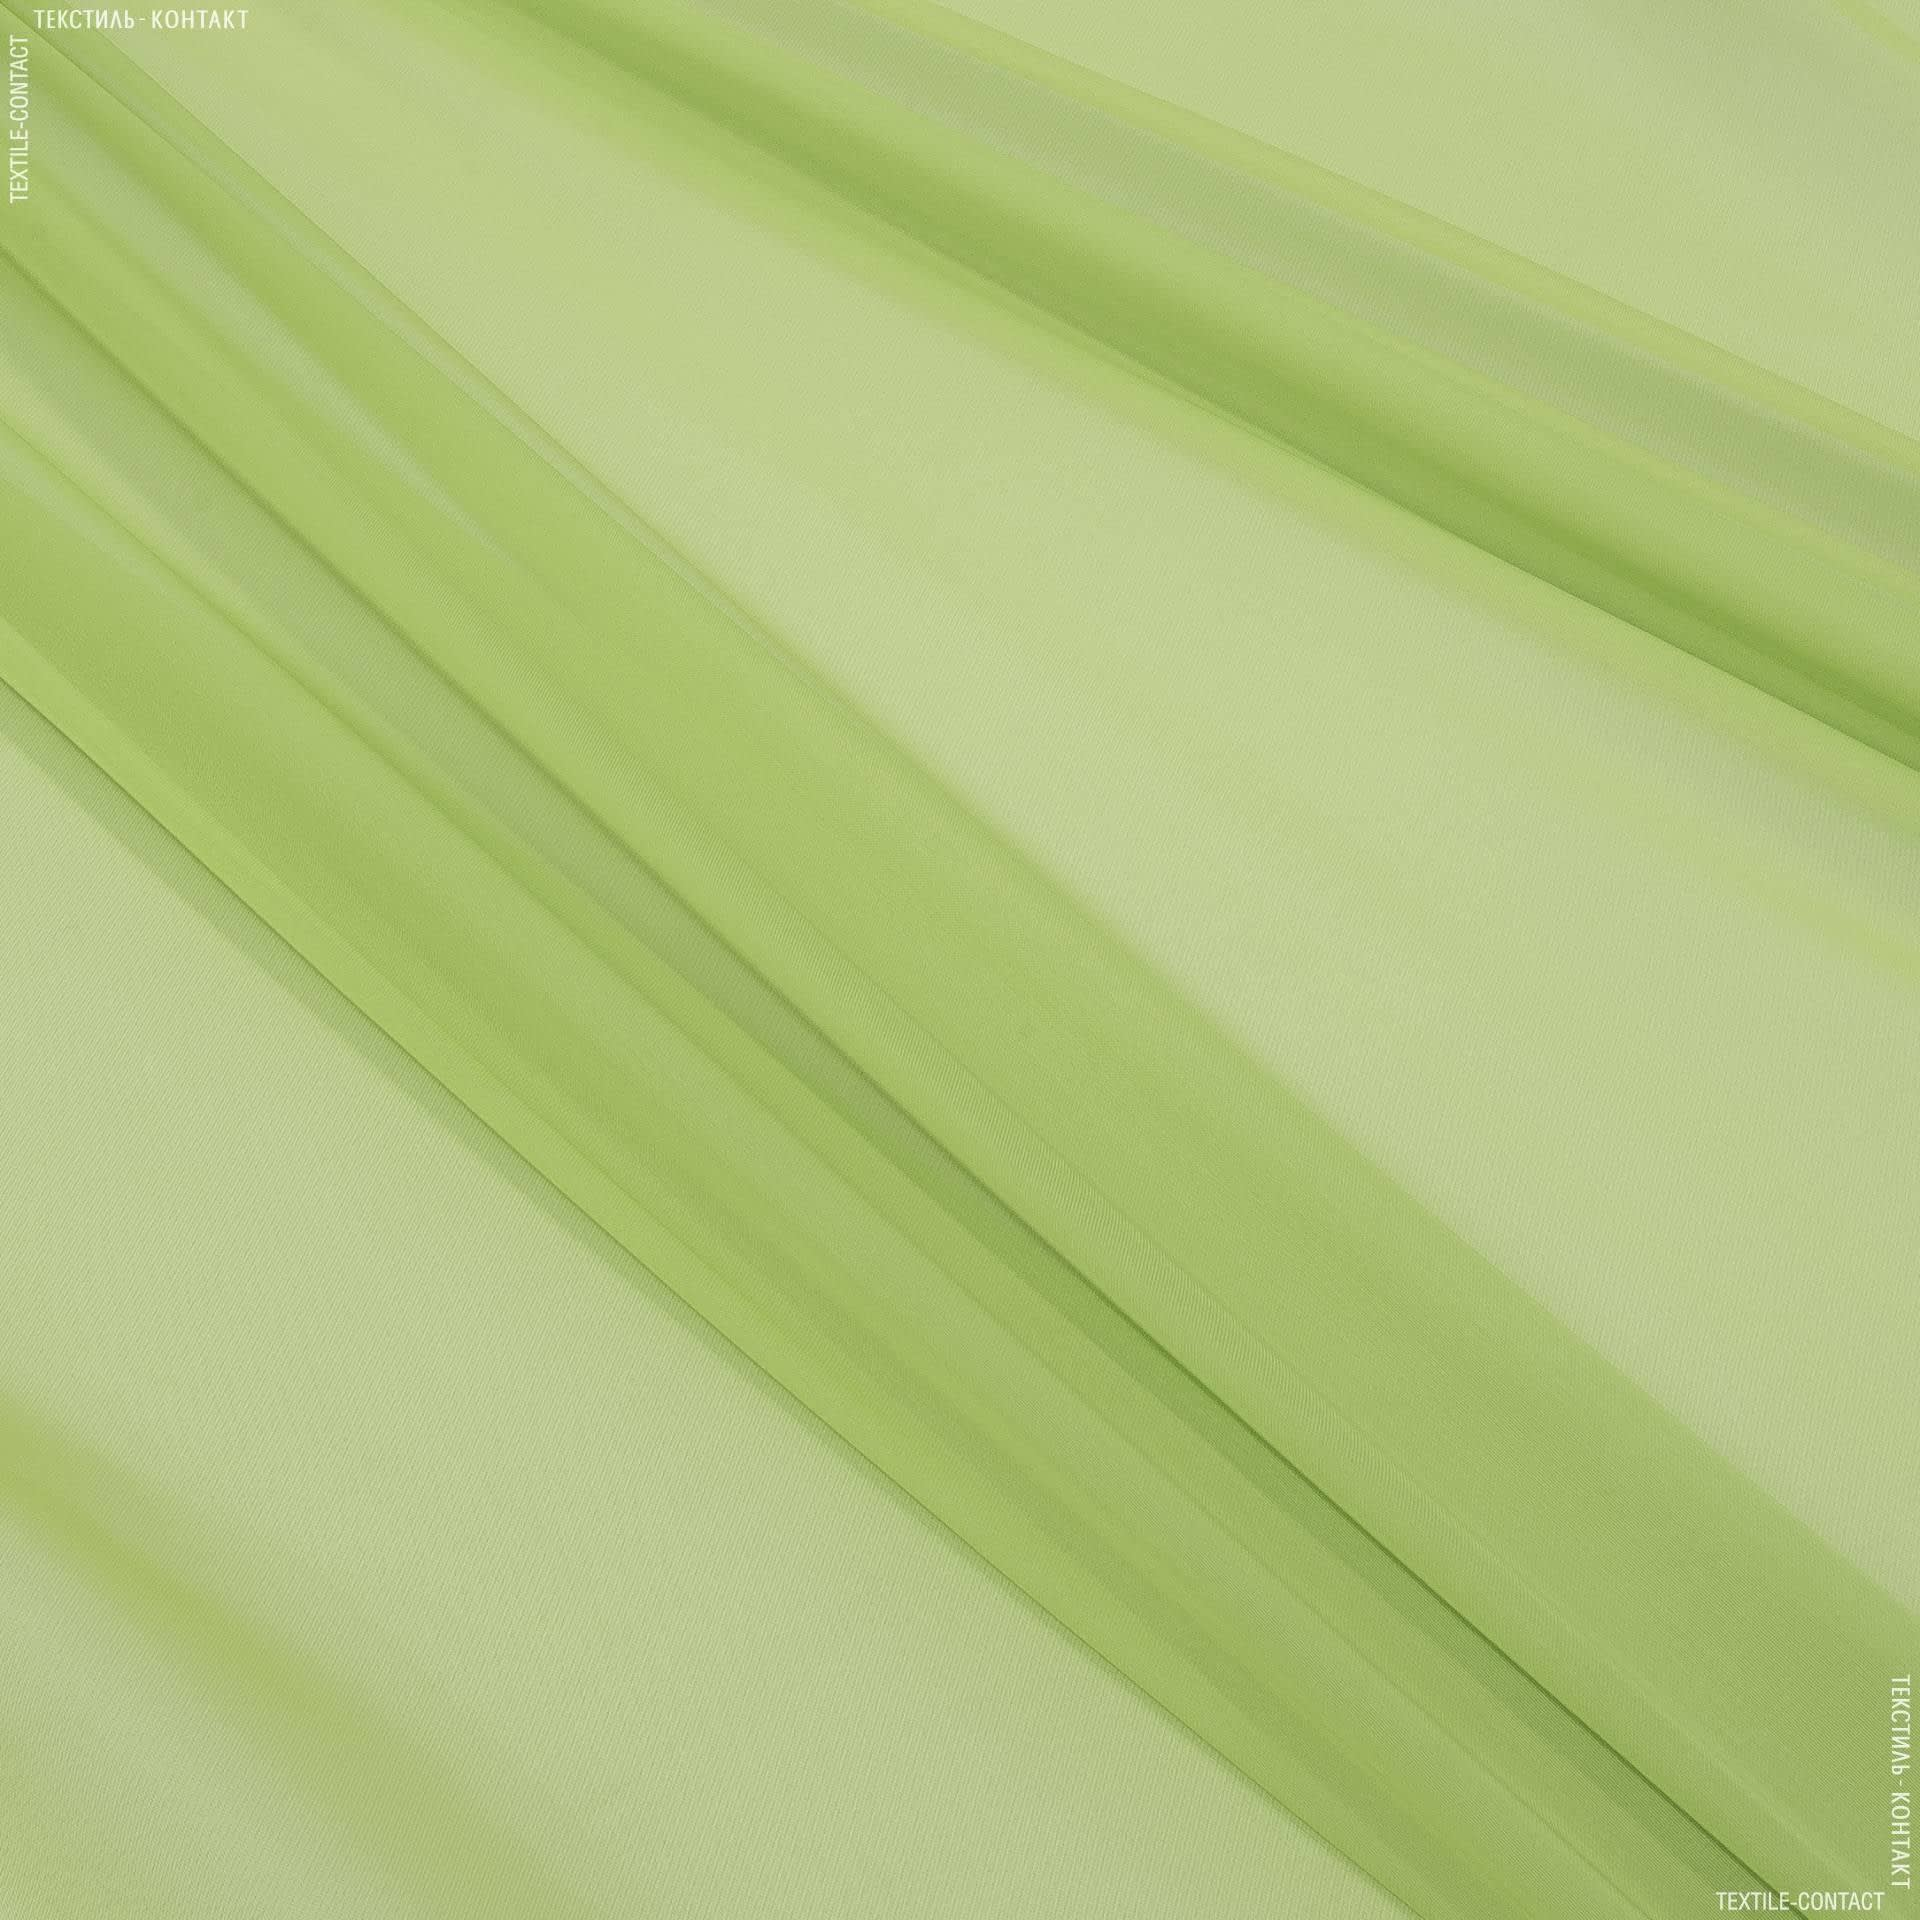 Тканини гардинні тканини - Тюль вуаль зелене яблуко